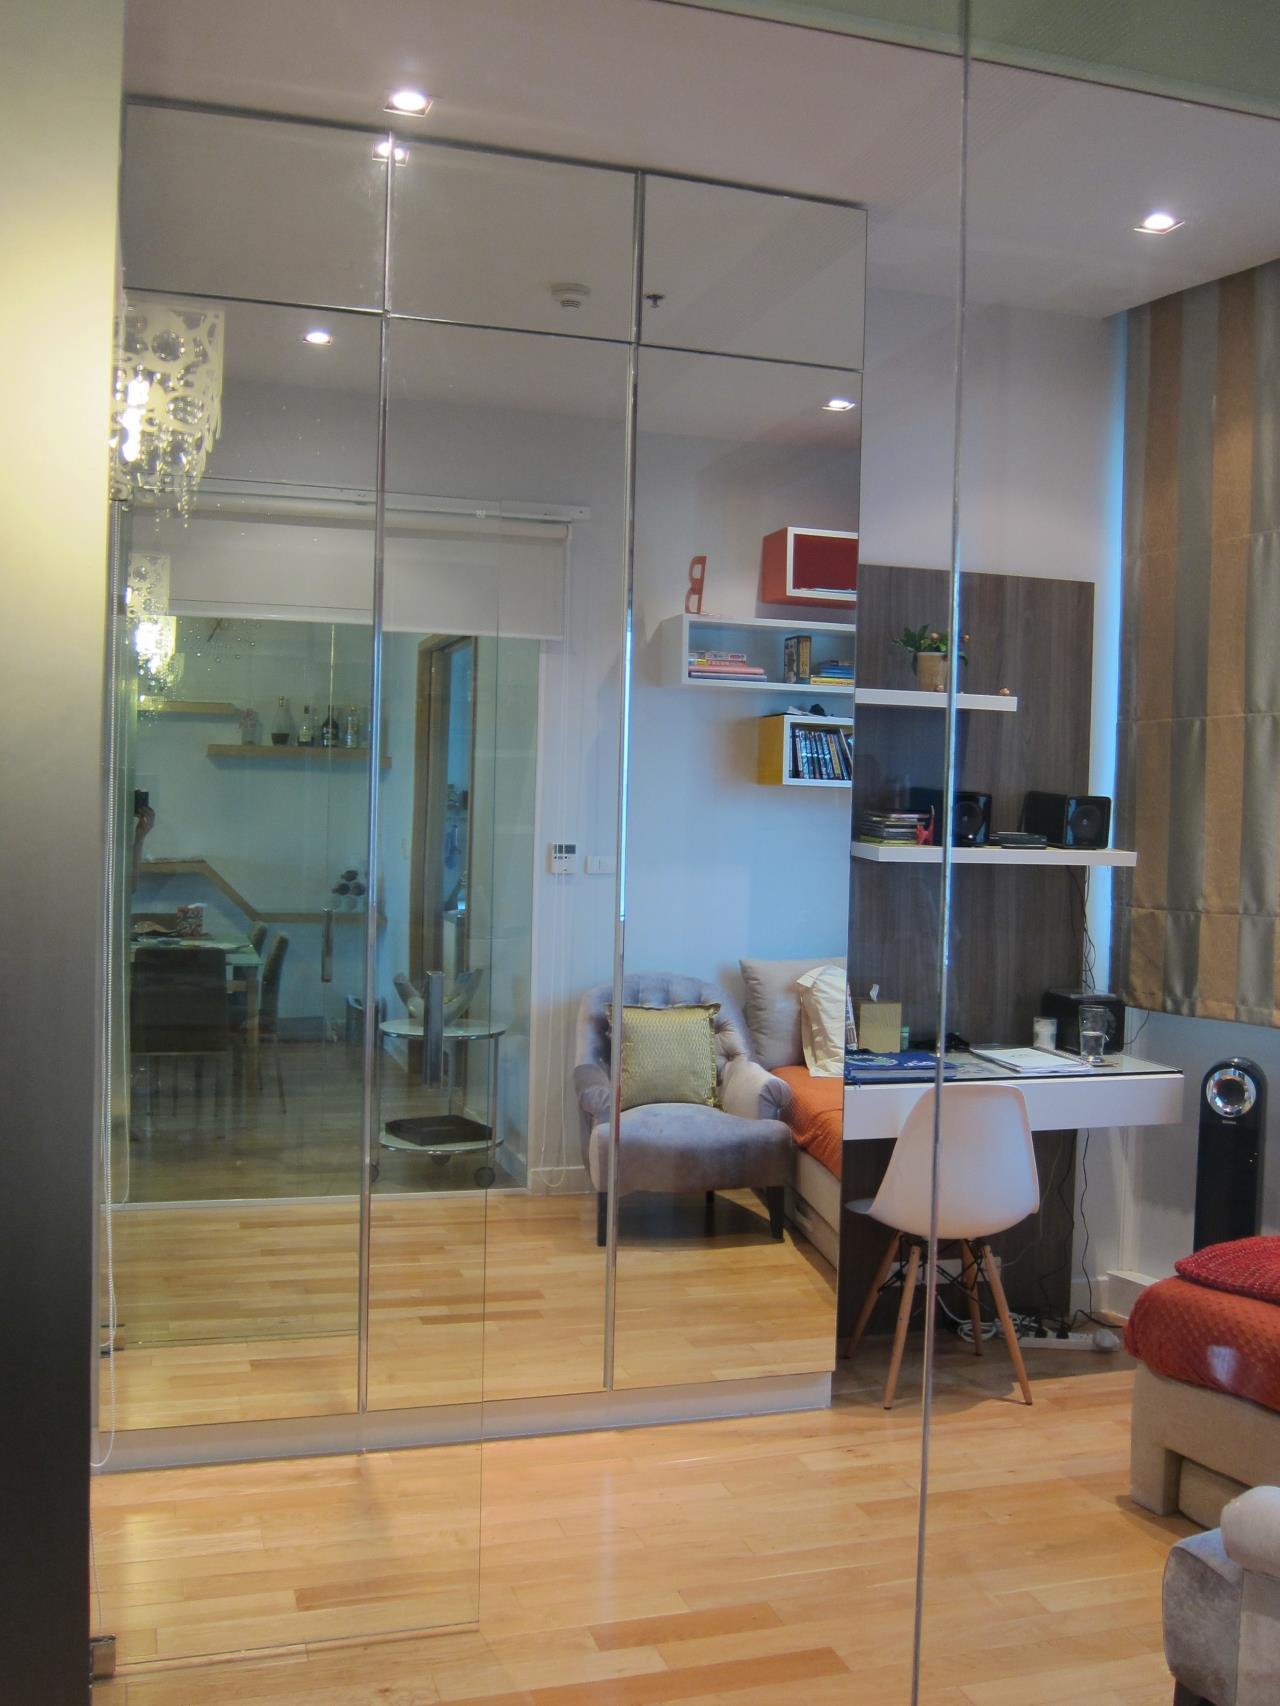 Piri Property Agency's 2 bedrooms Condominium  on tower B floor For Rent 2 4